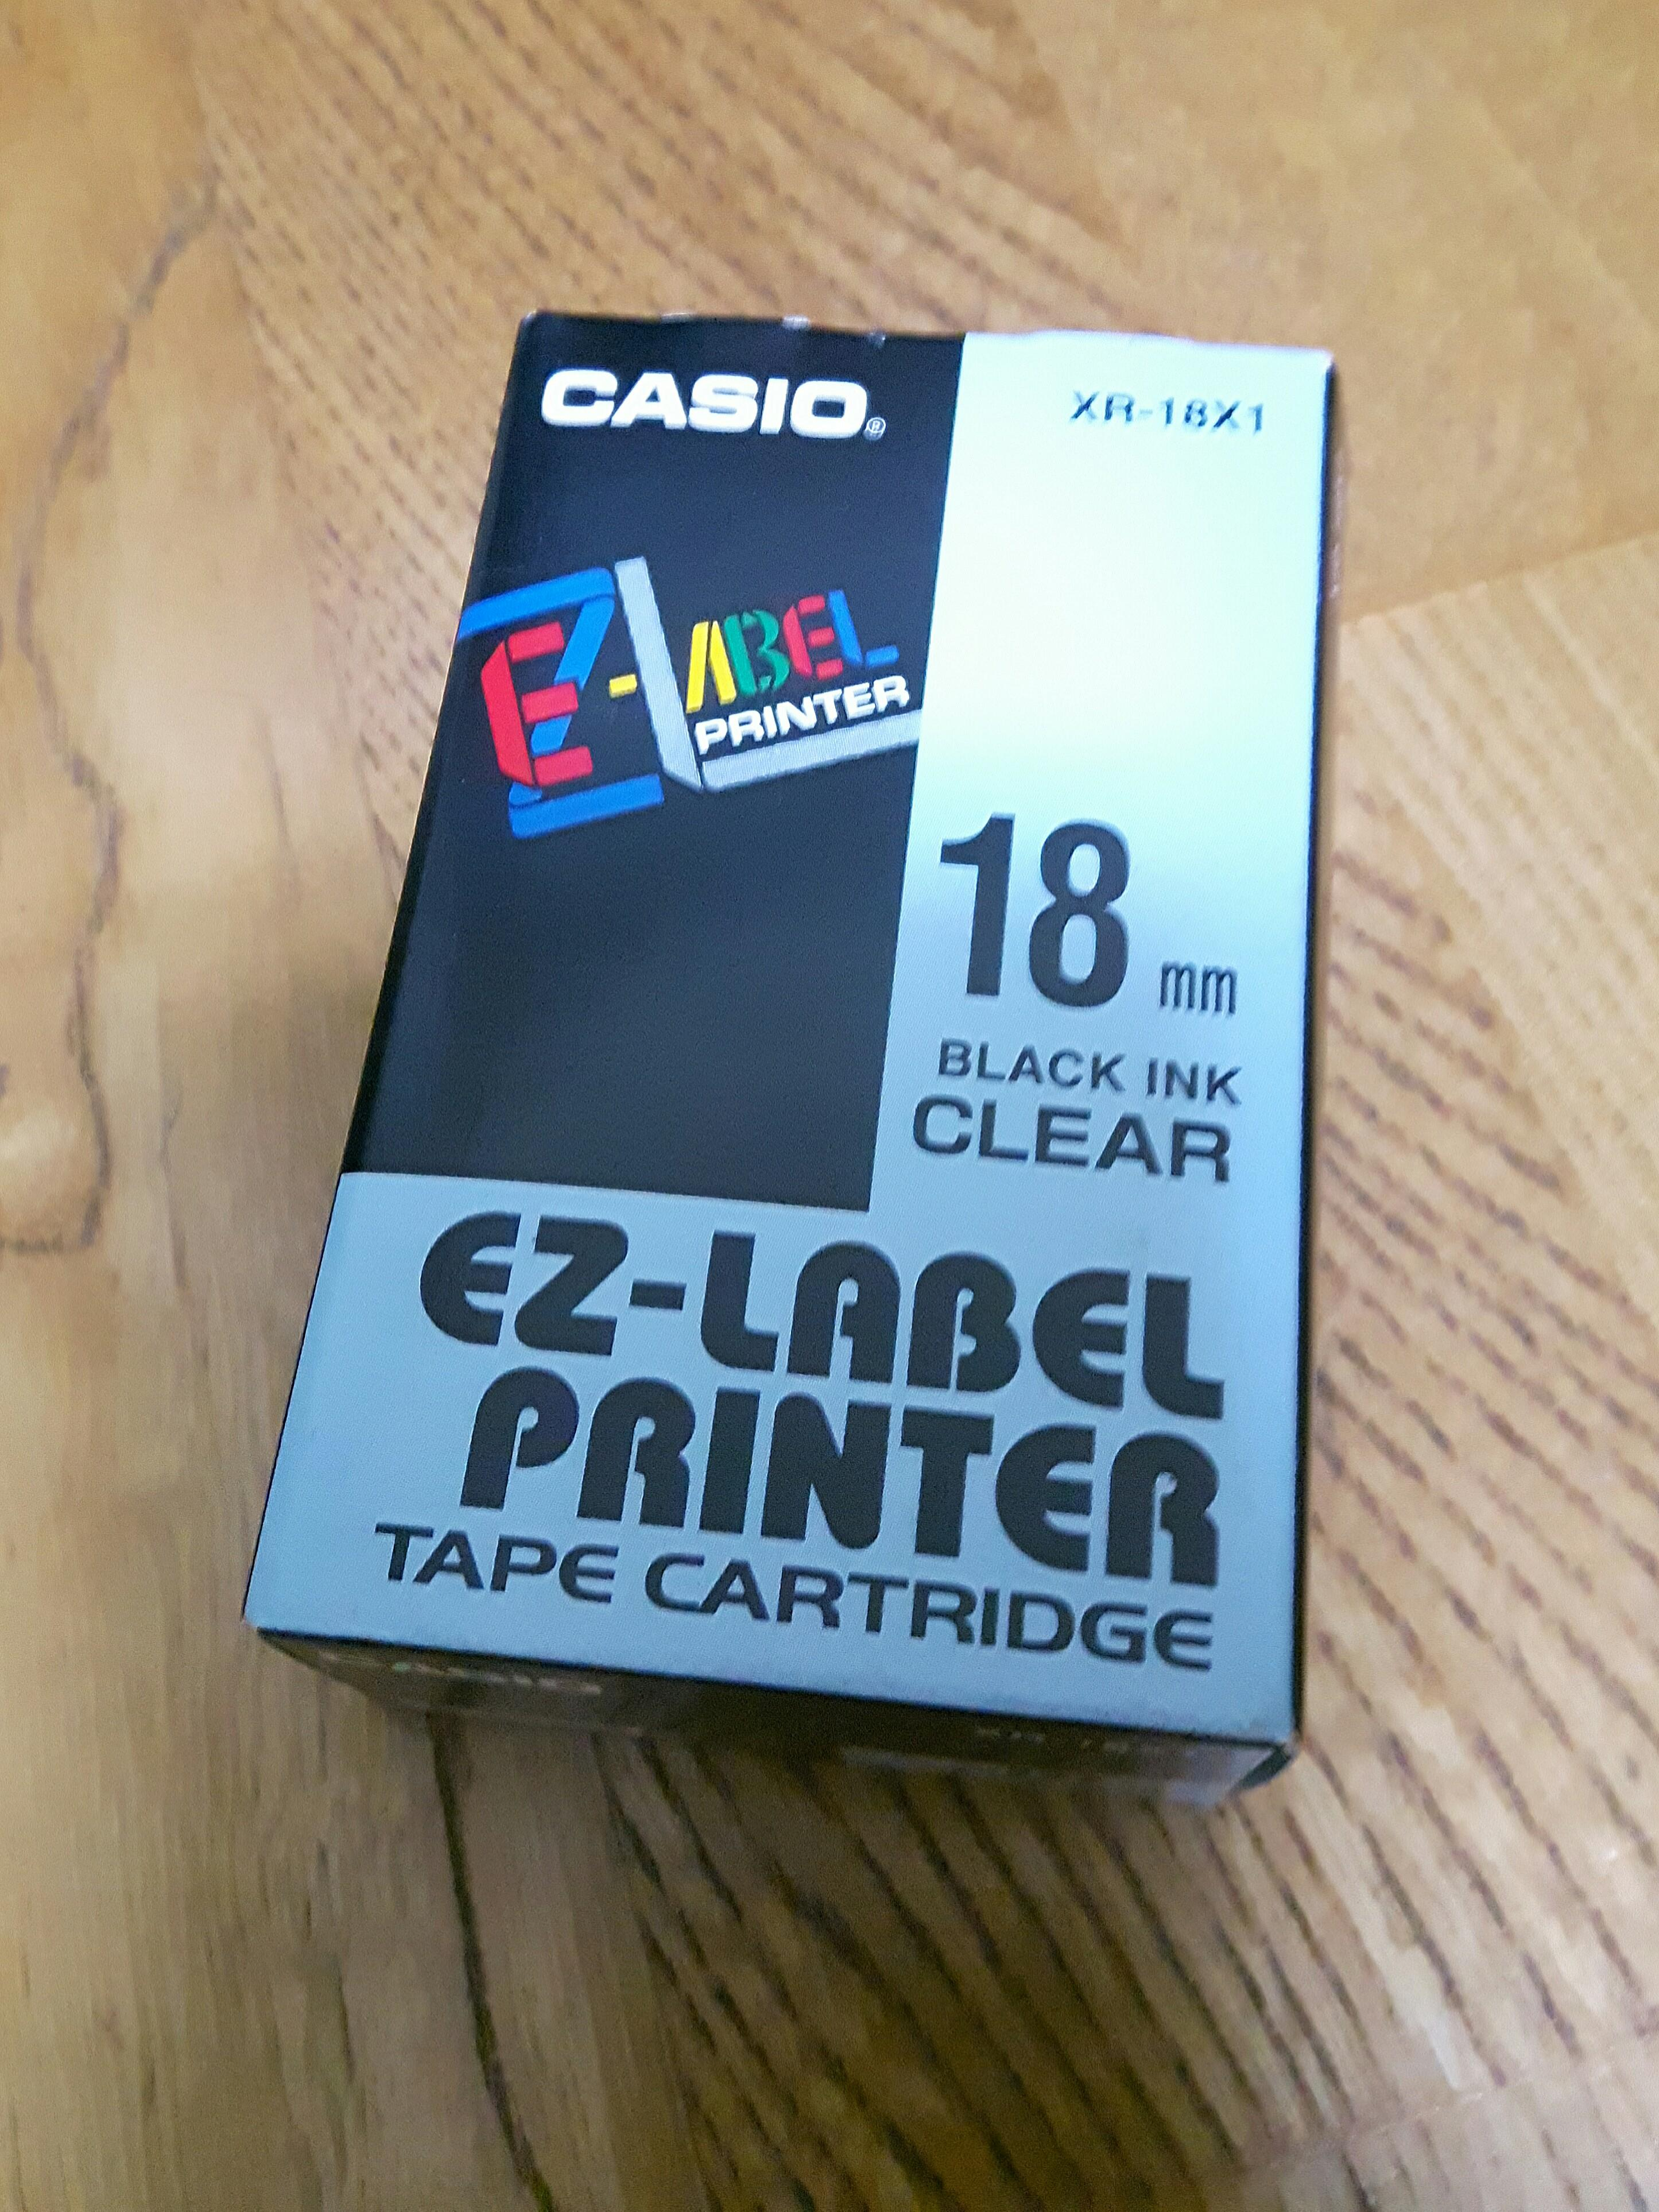 CASIO 卡西歐 18mm XR-18X1透明底黑字 原廠標籤色帶